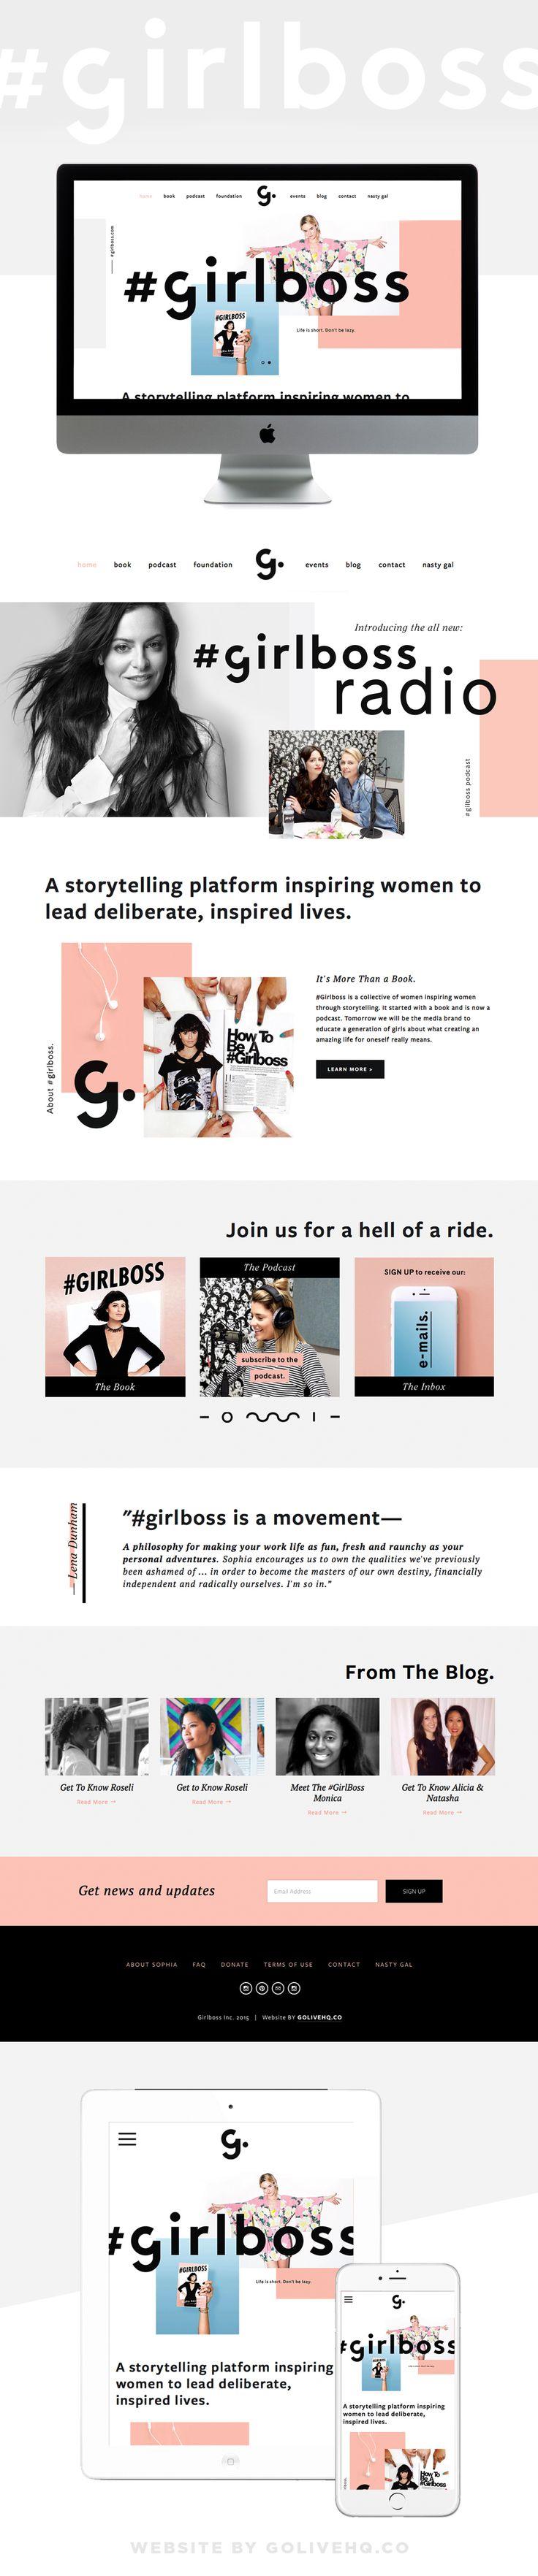 modern website design for girlboss.com  |  by golivehq.co